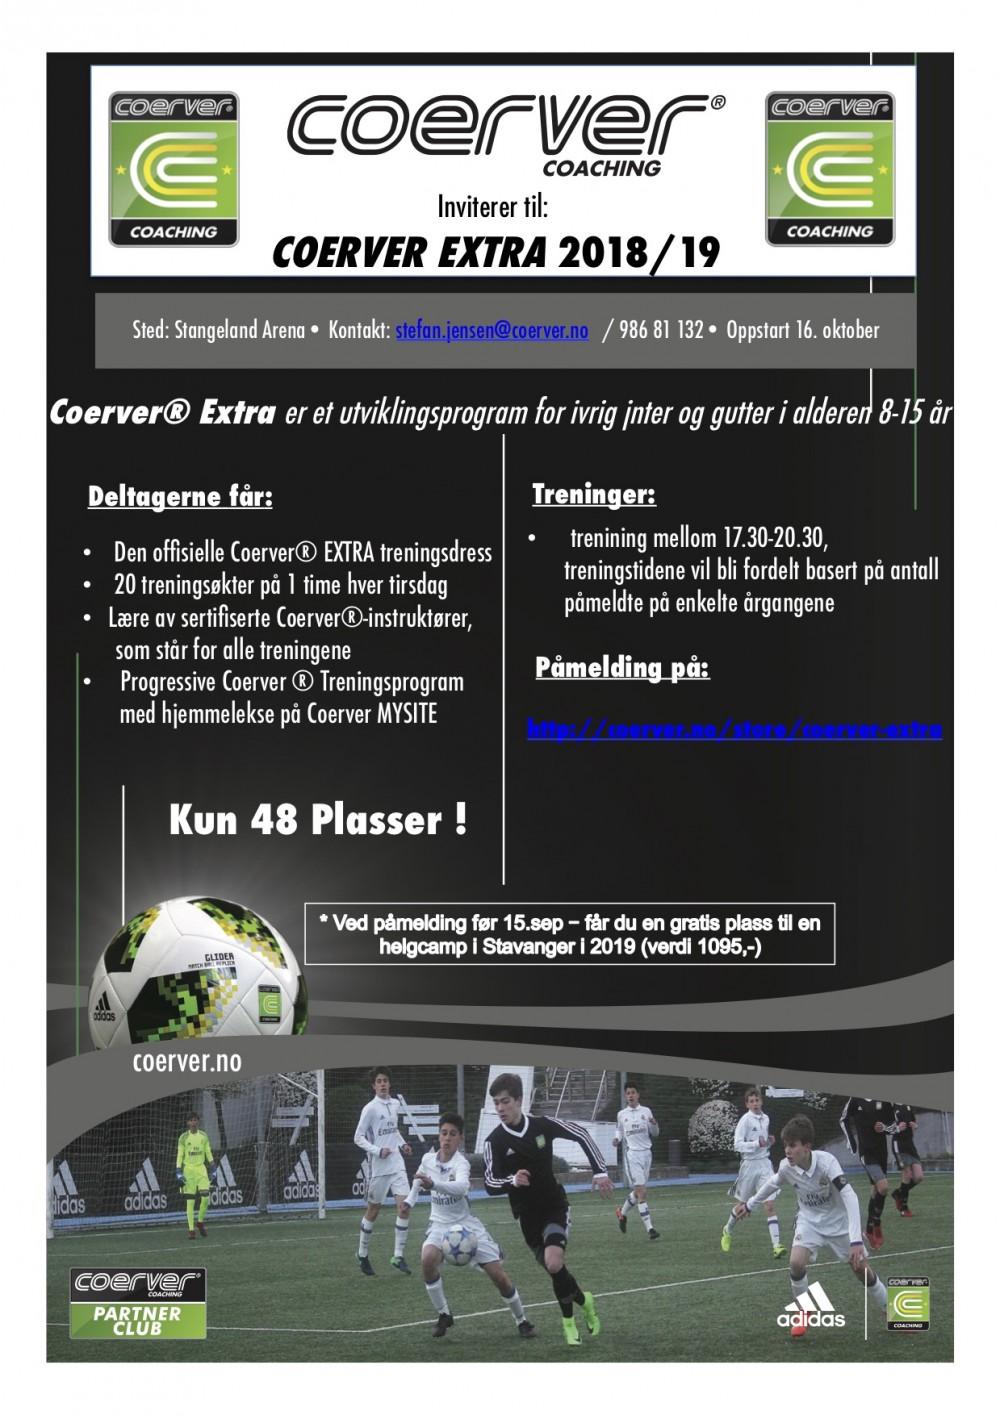 Coerver Extra på Stangeland Arena (Stavanger) 2018/19